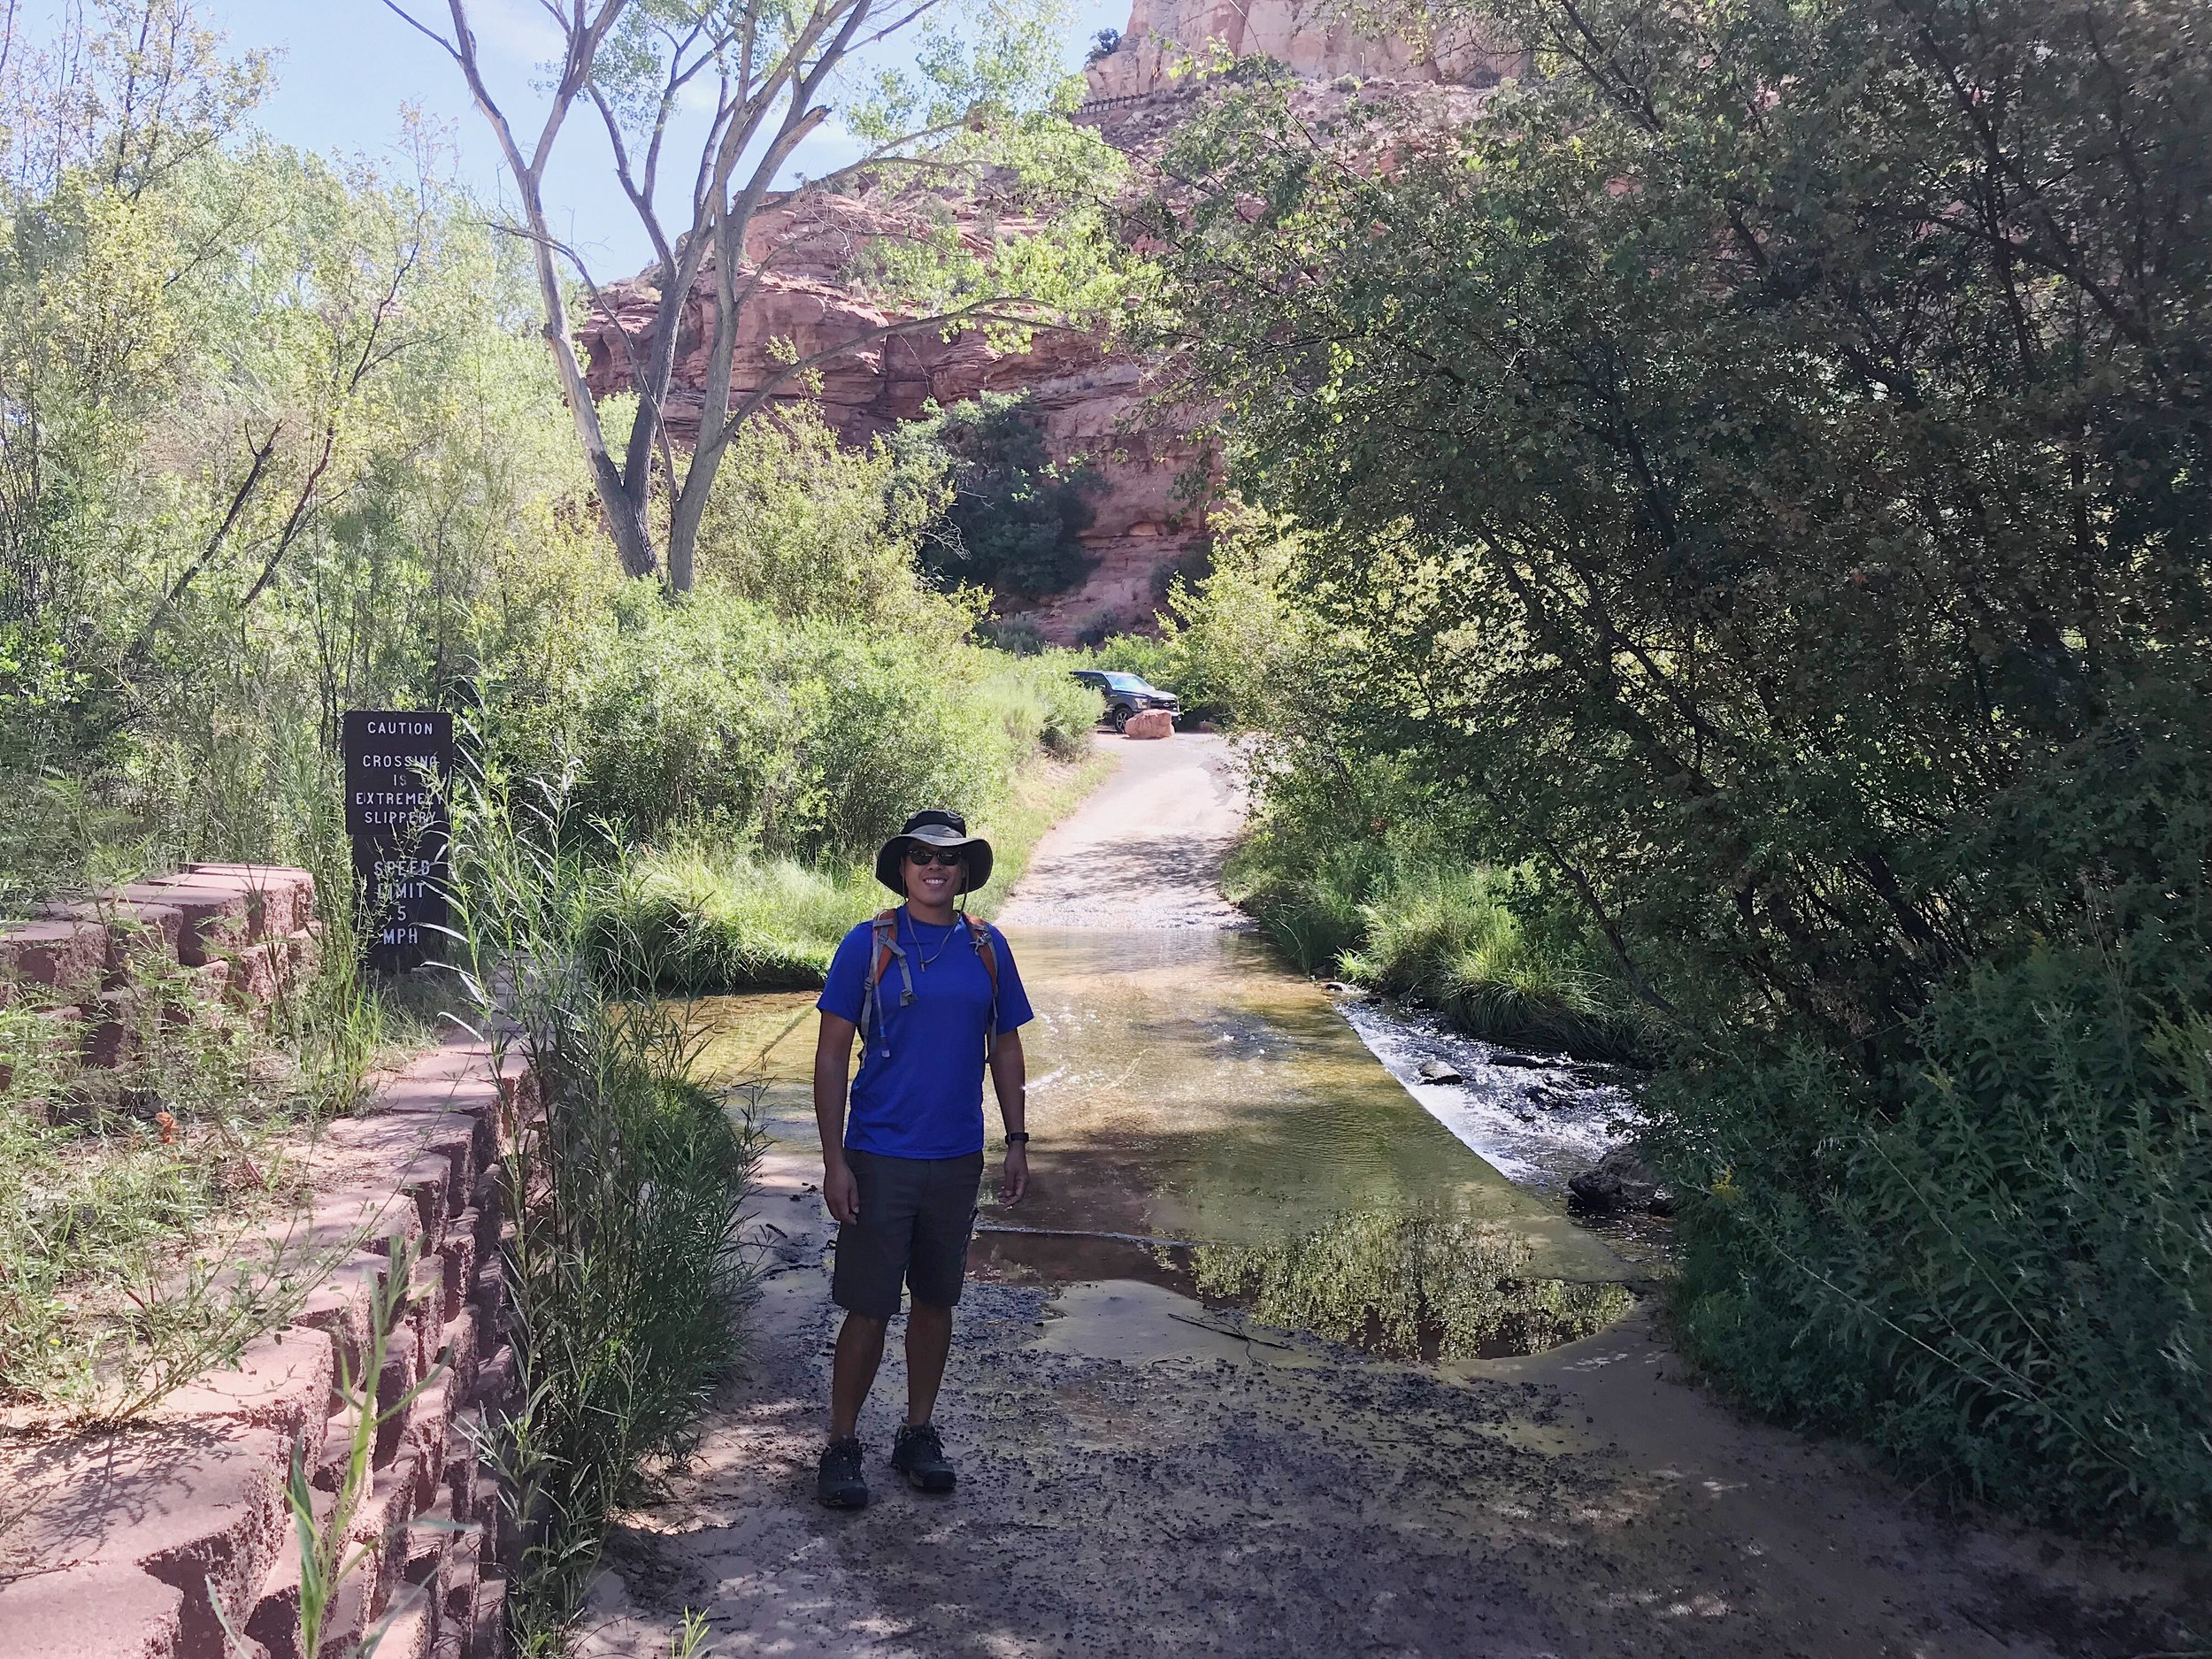 Walking to the trailhead